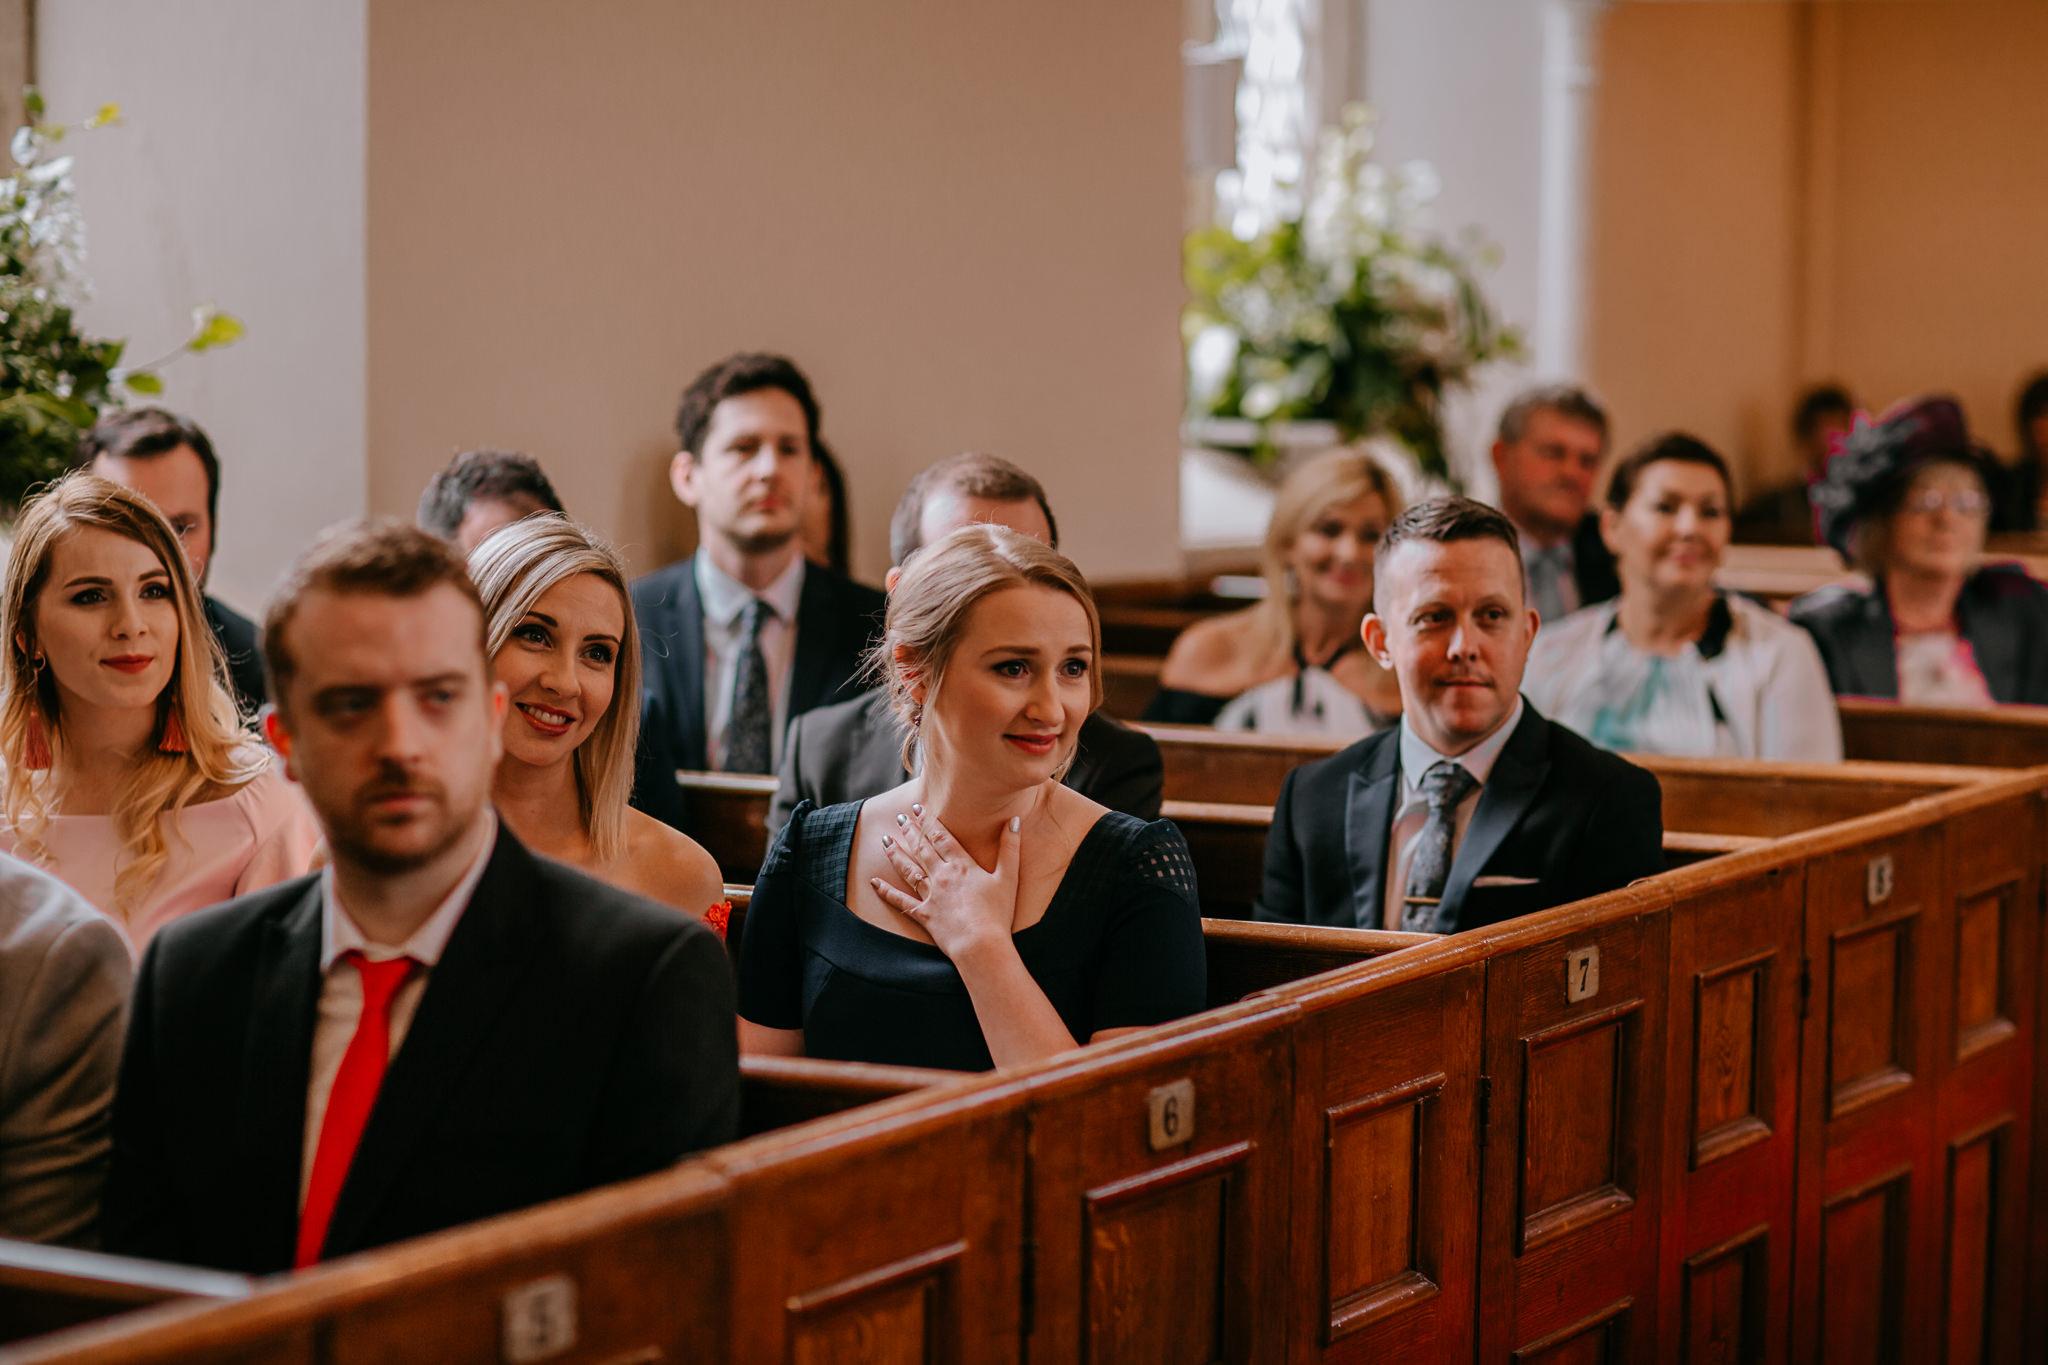 Northern-Ireland-wedding-photographers-the-martins-outdoor-barn-wedding-66.jpg